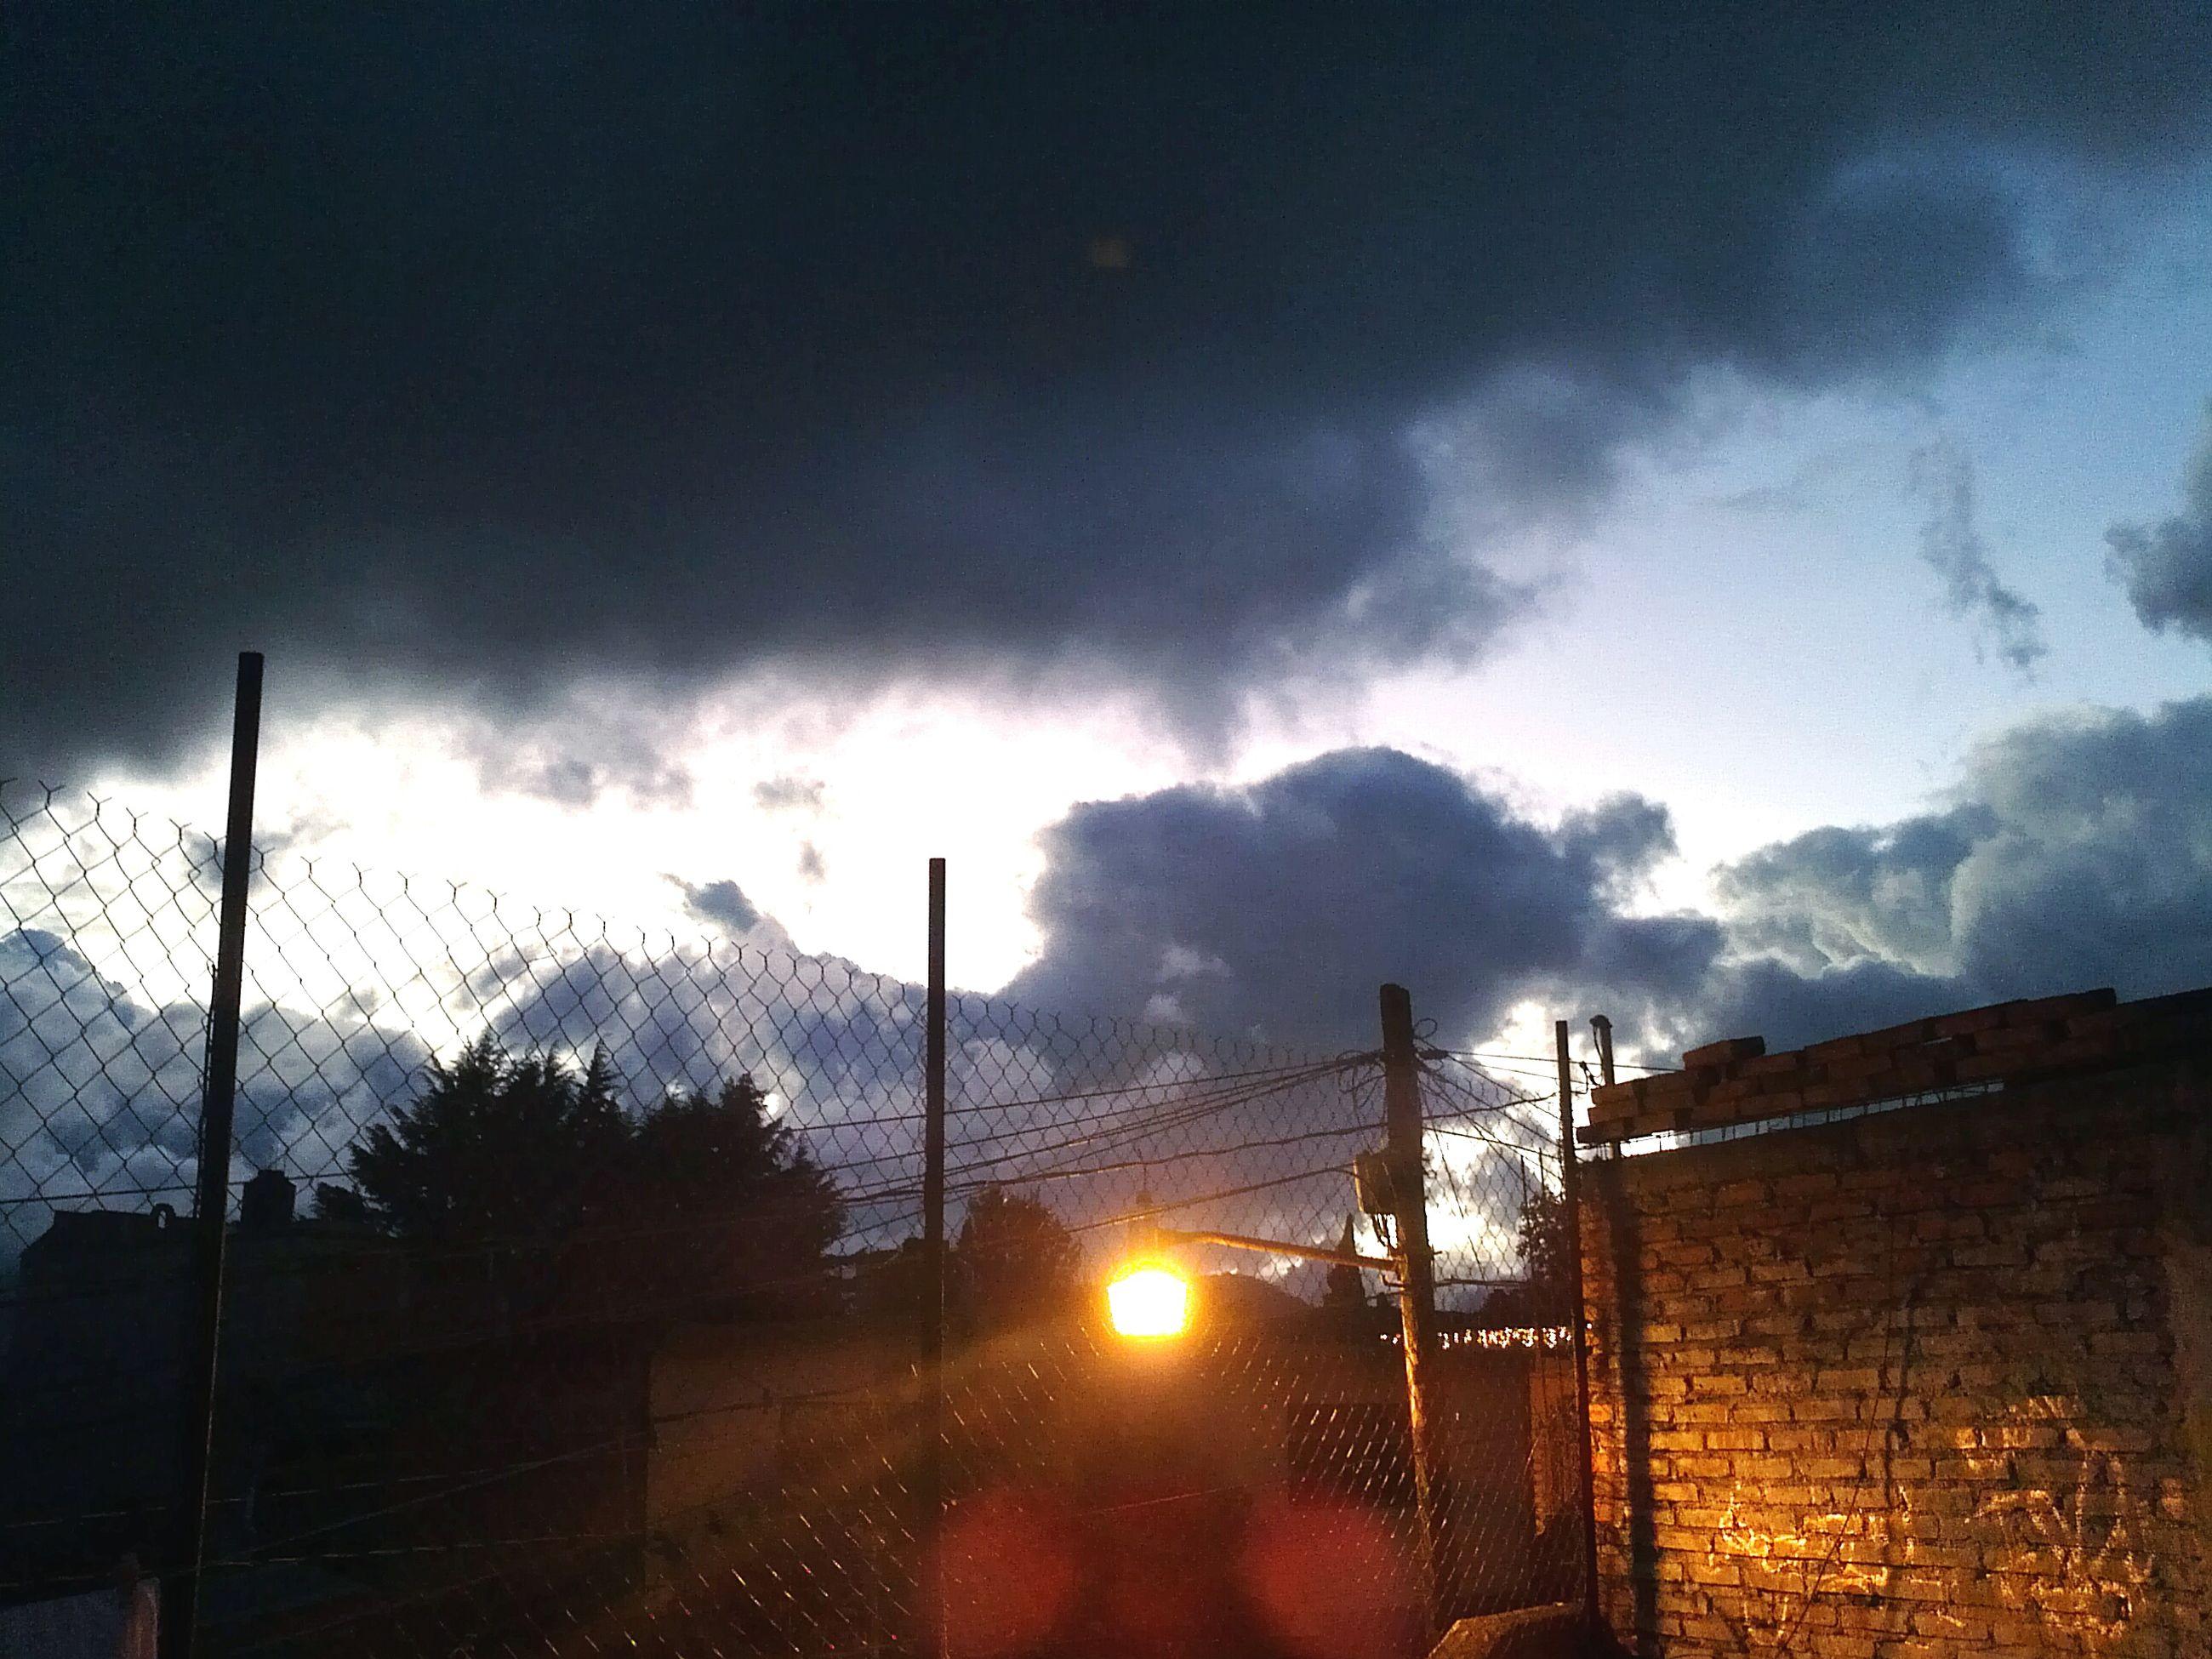 sky, cloud - sky, cloudy, weather, built structure, building exterior, architecture, street light, fence, cloud, dusk, overcast, storm cloud, nature, no people, factory, outdoors, house, transportation, road